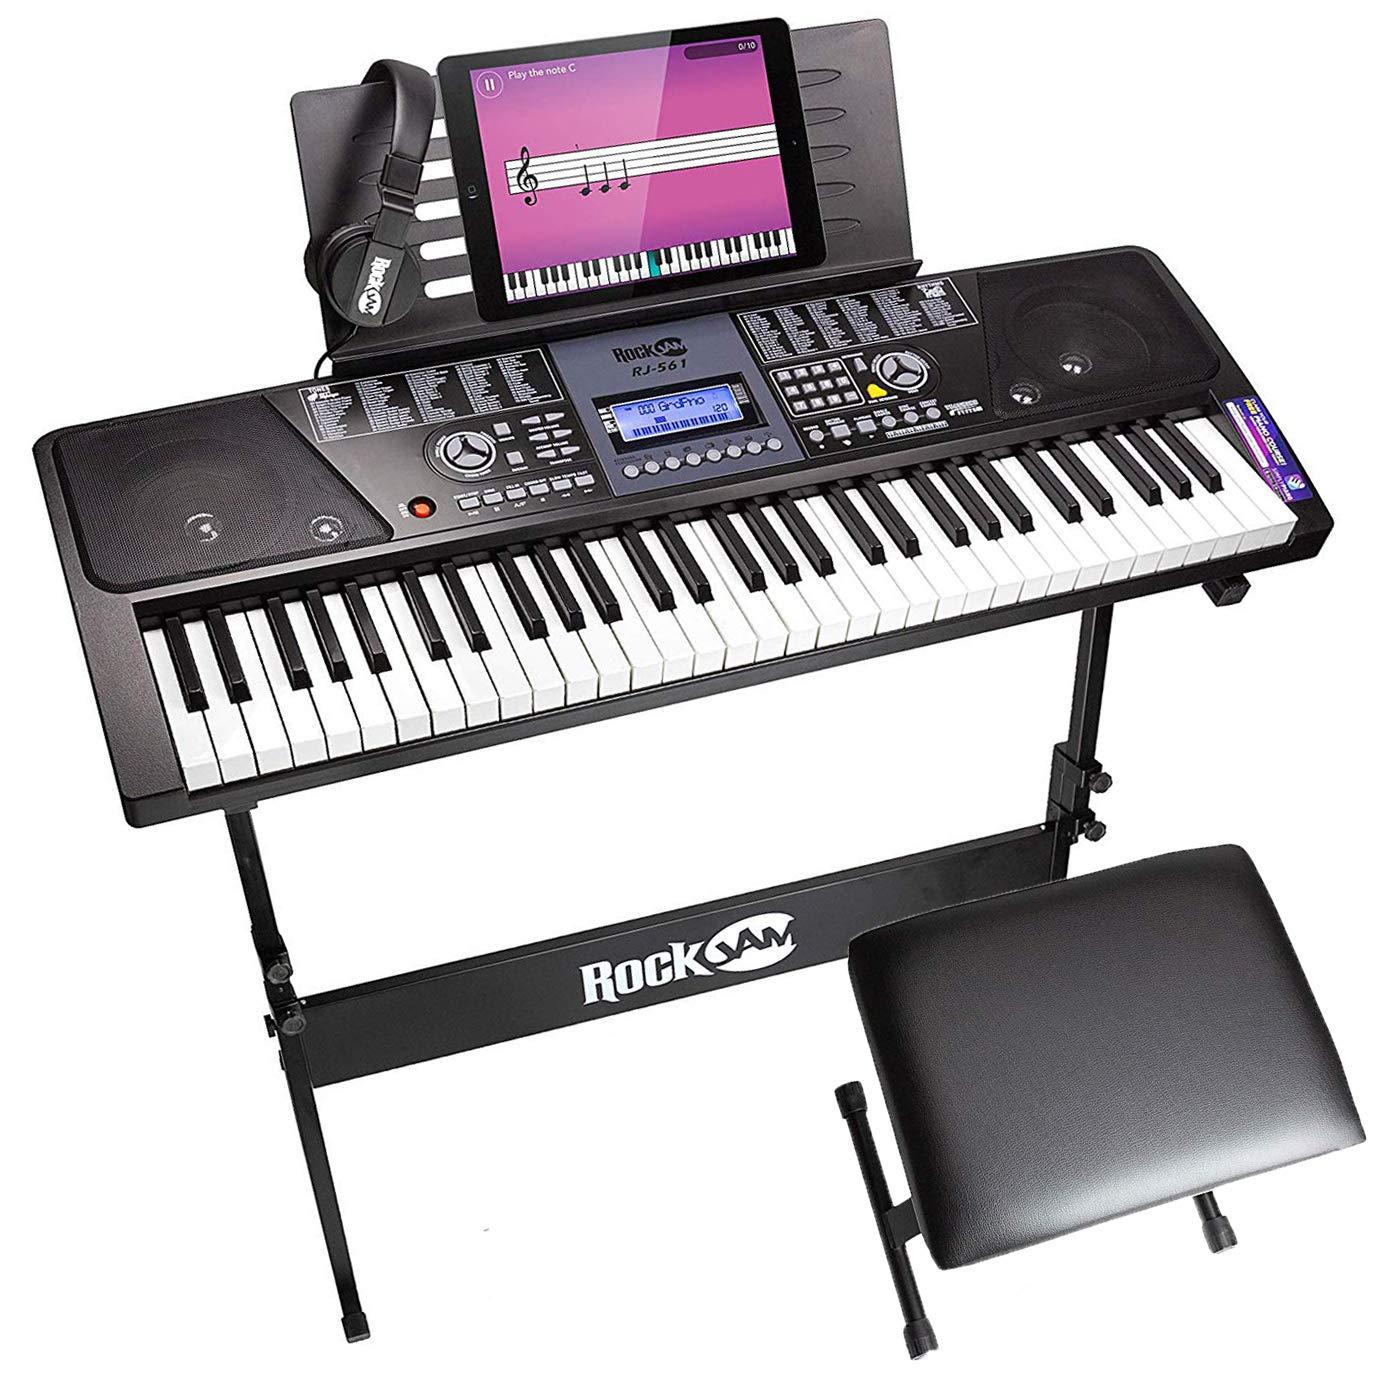 RockJam RJ561 61-Key Electronic Keyboard Piano (SuperKit)